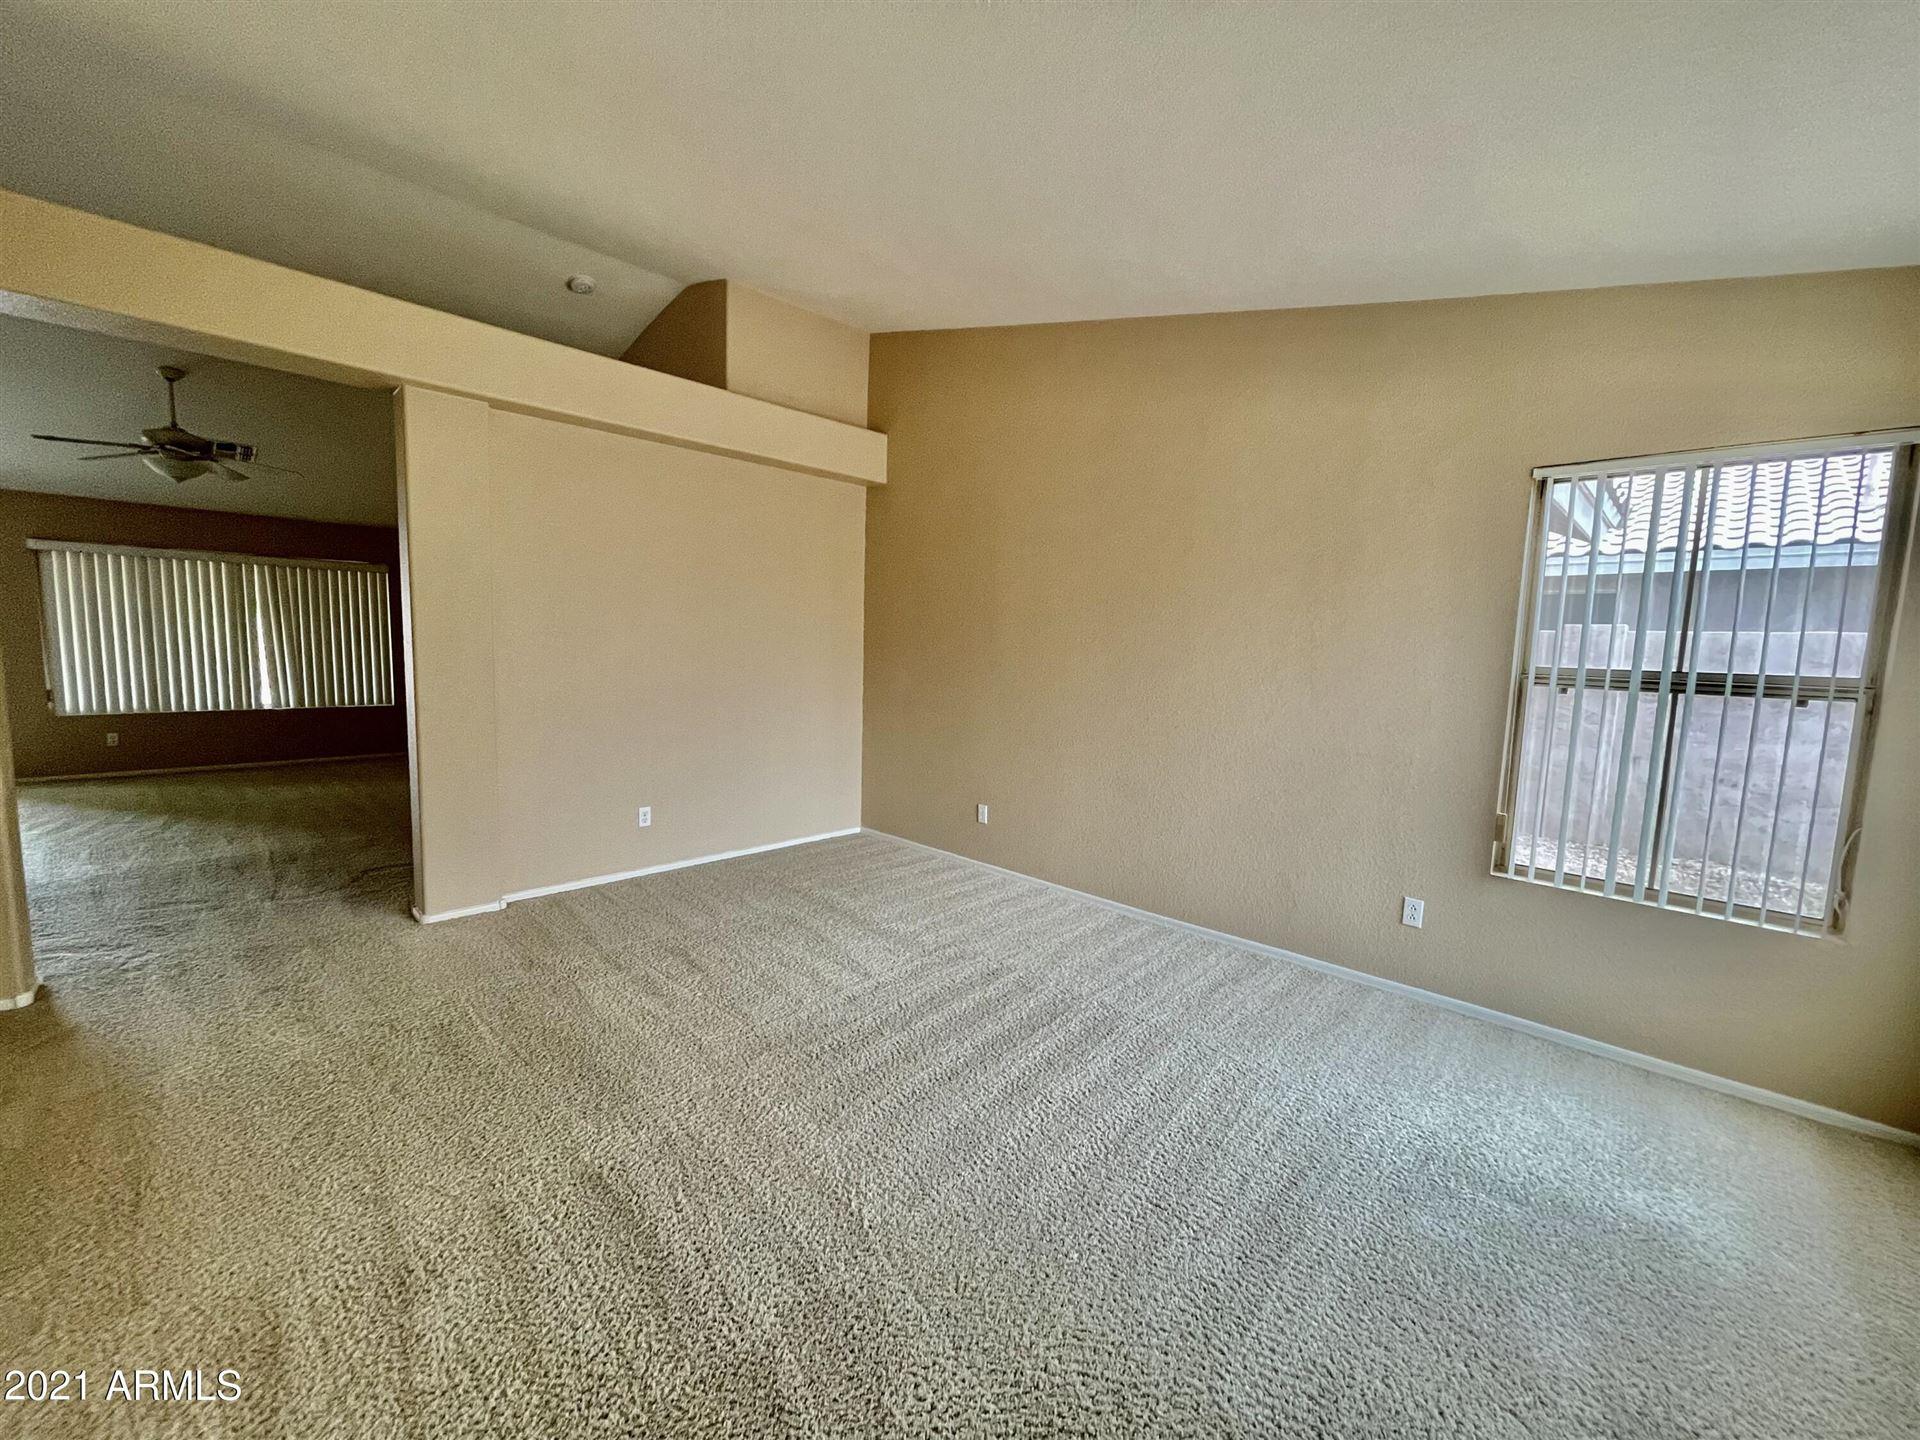 Photo of 1644 W LARK Drive, Chandler, AZ 85286 (MLS # 6269251)